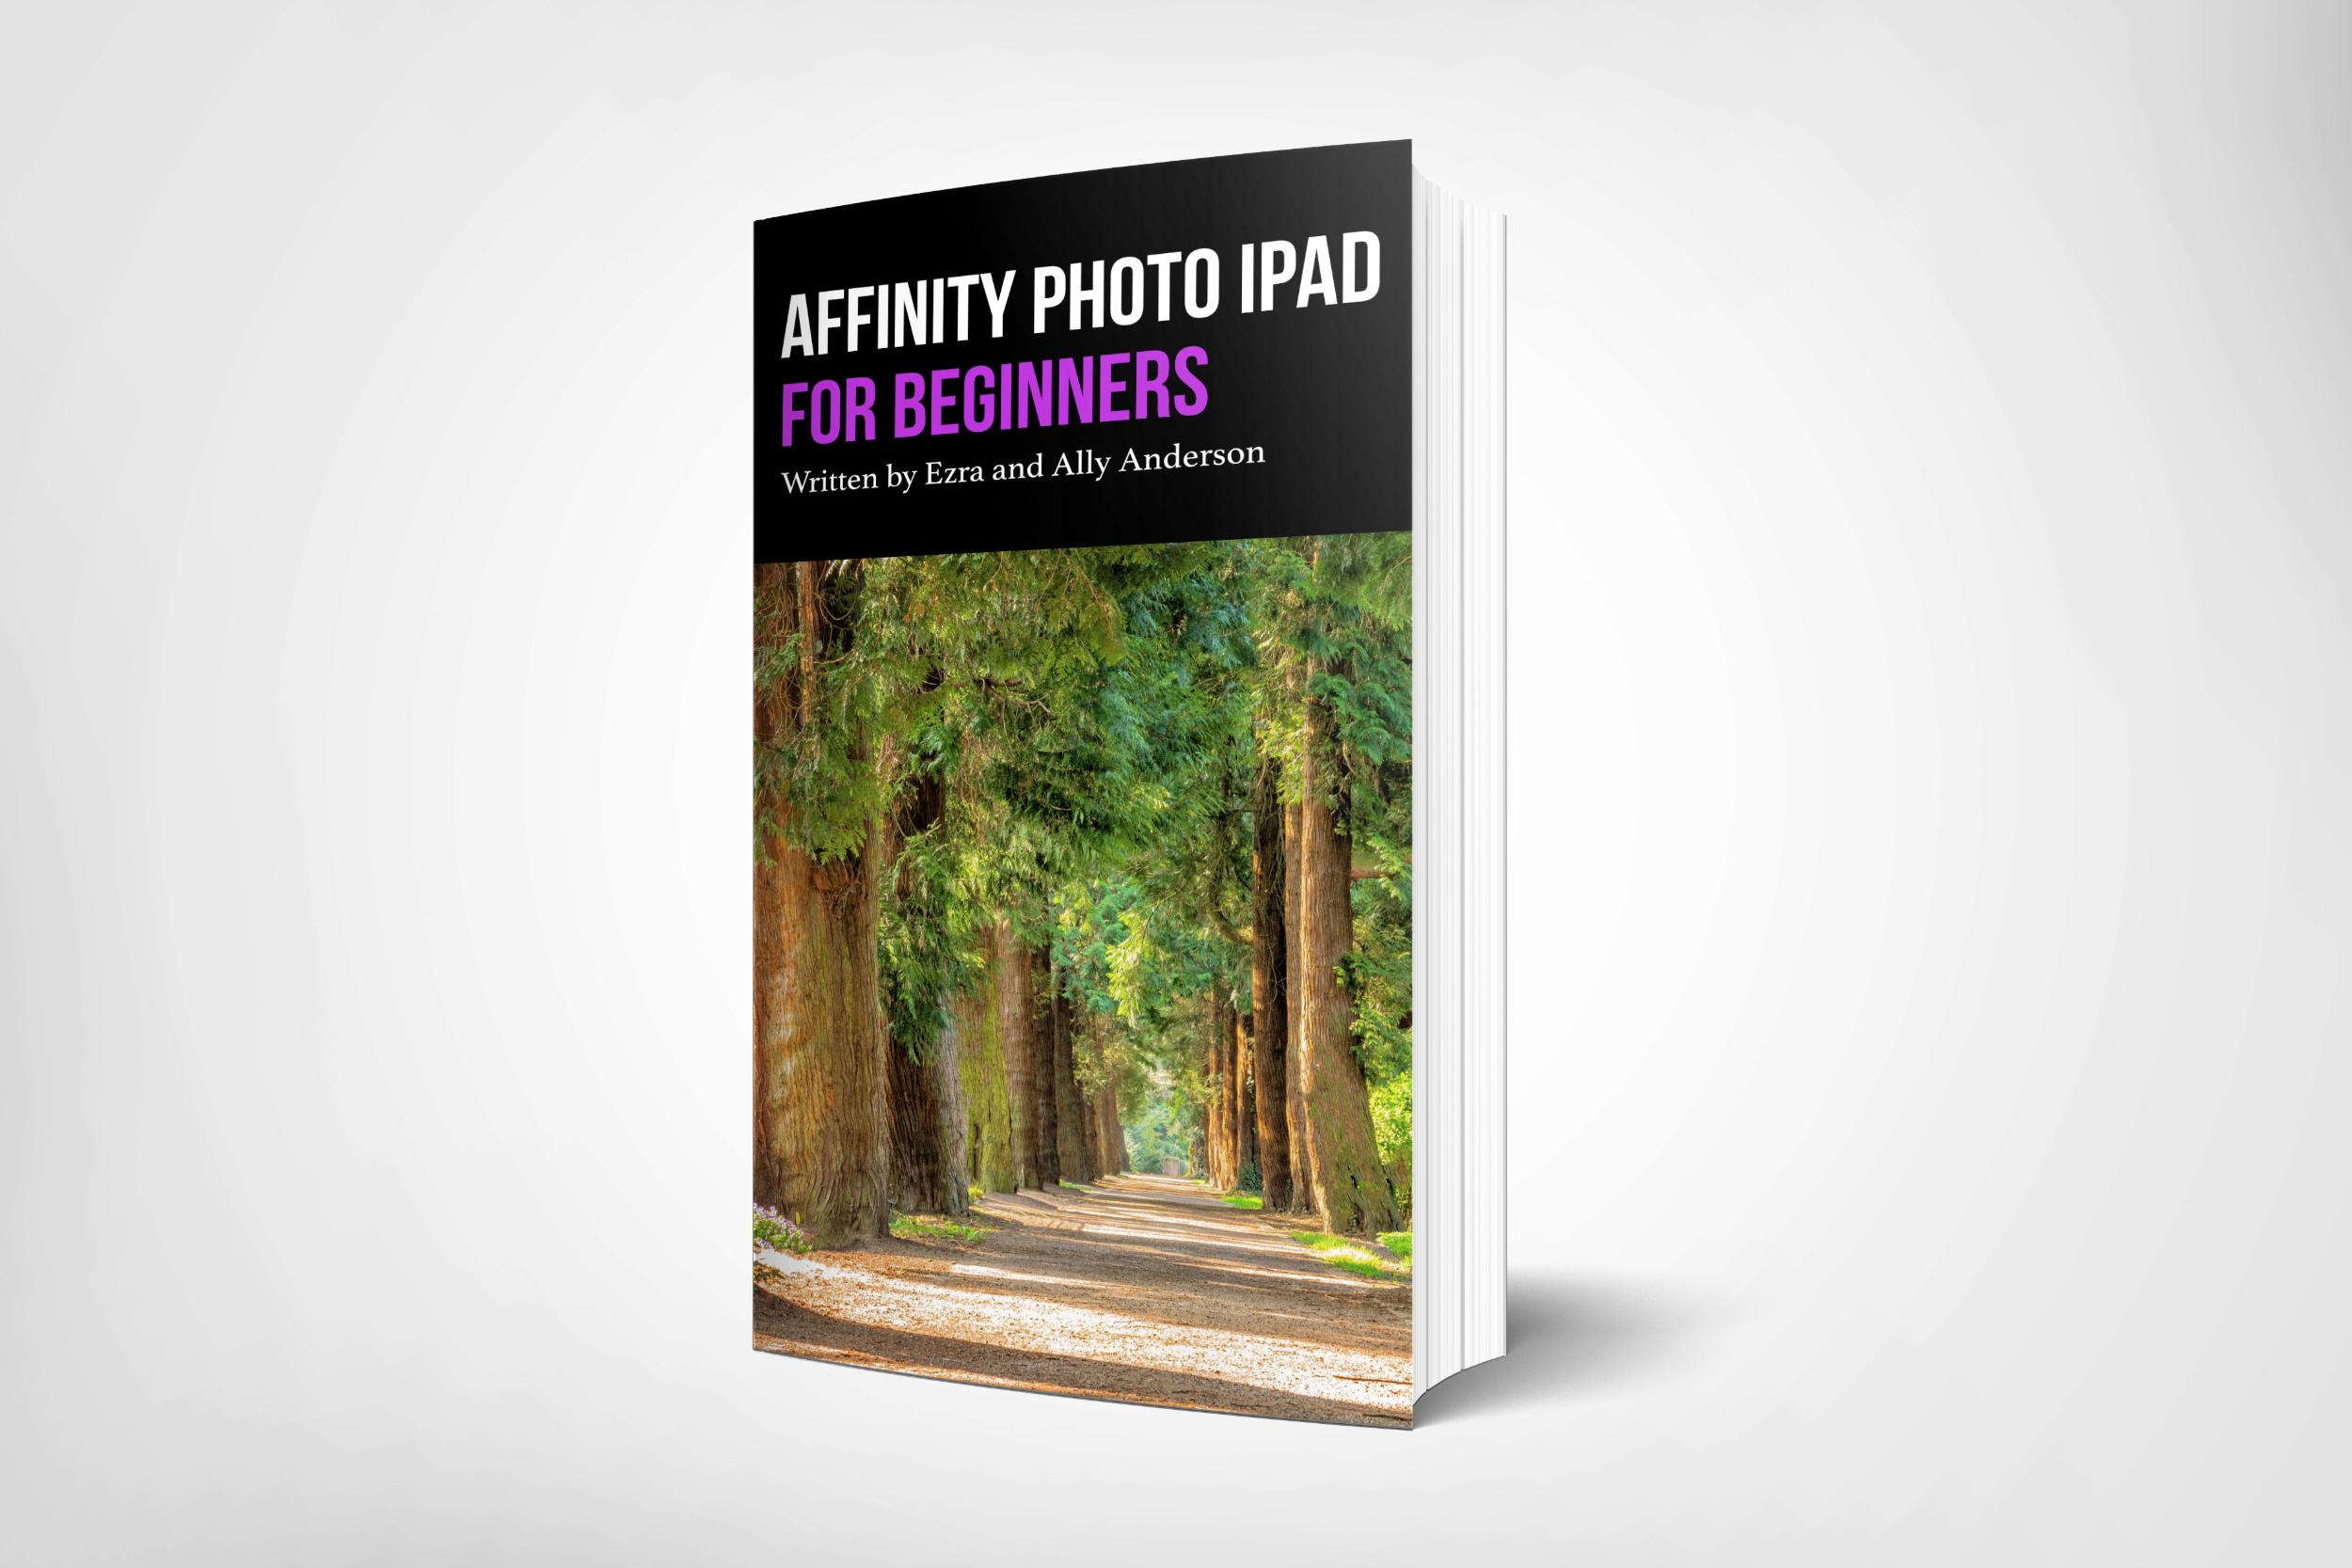 affinity photo free download ipad